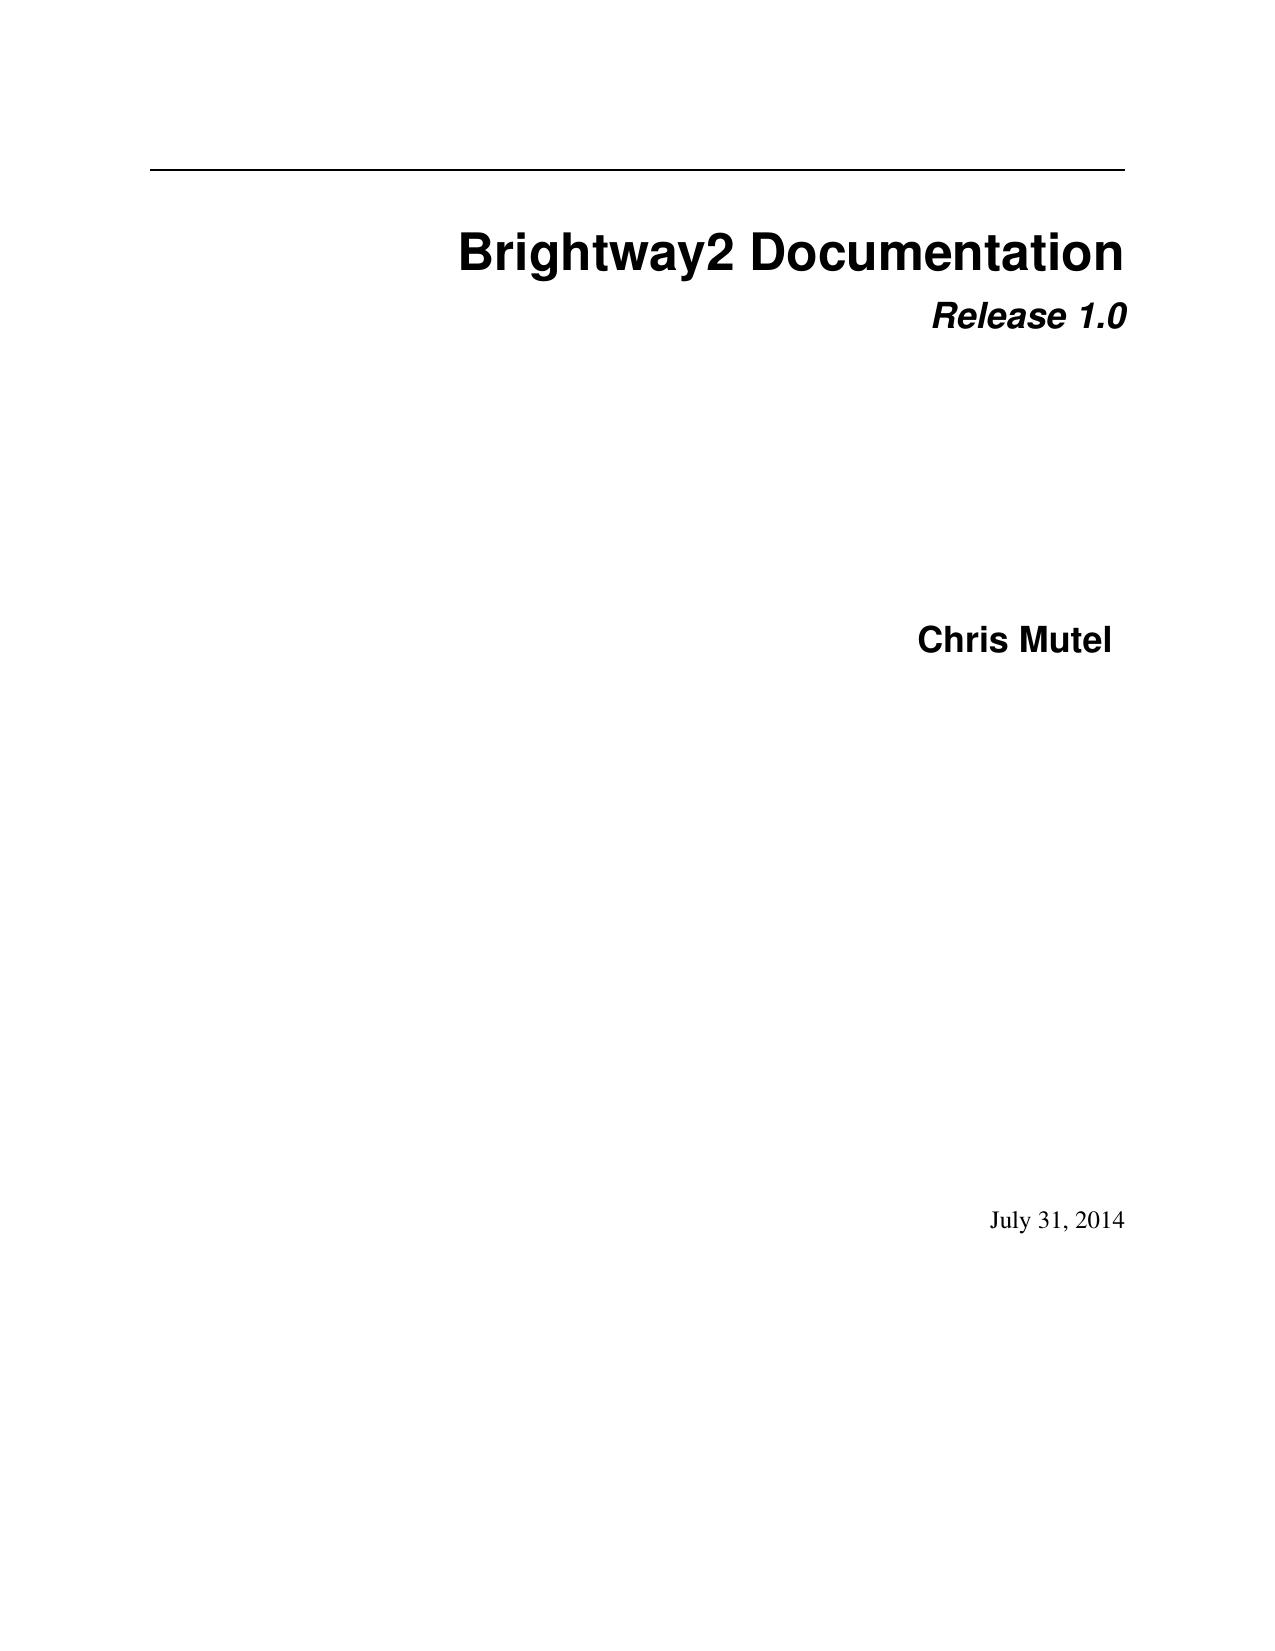 Brightway2 Documentation | manualzz com